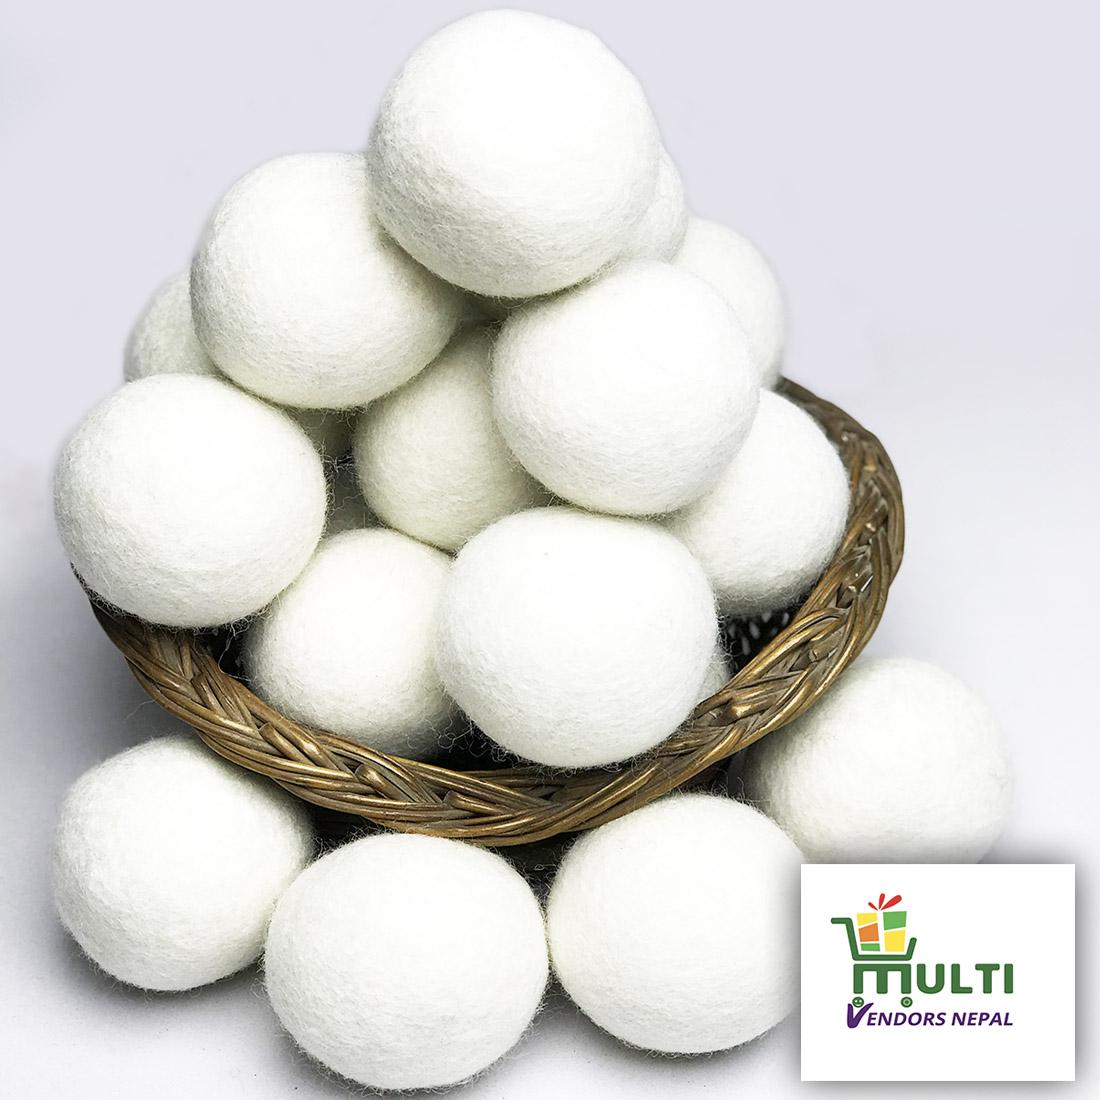 Natural Wool Dryer Balls - Wholesale Bulk Box Pack of  200 Pcs